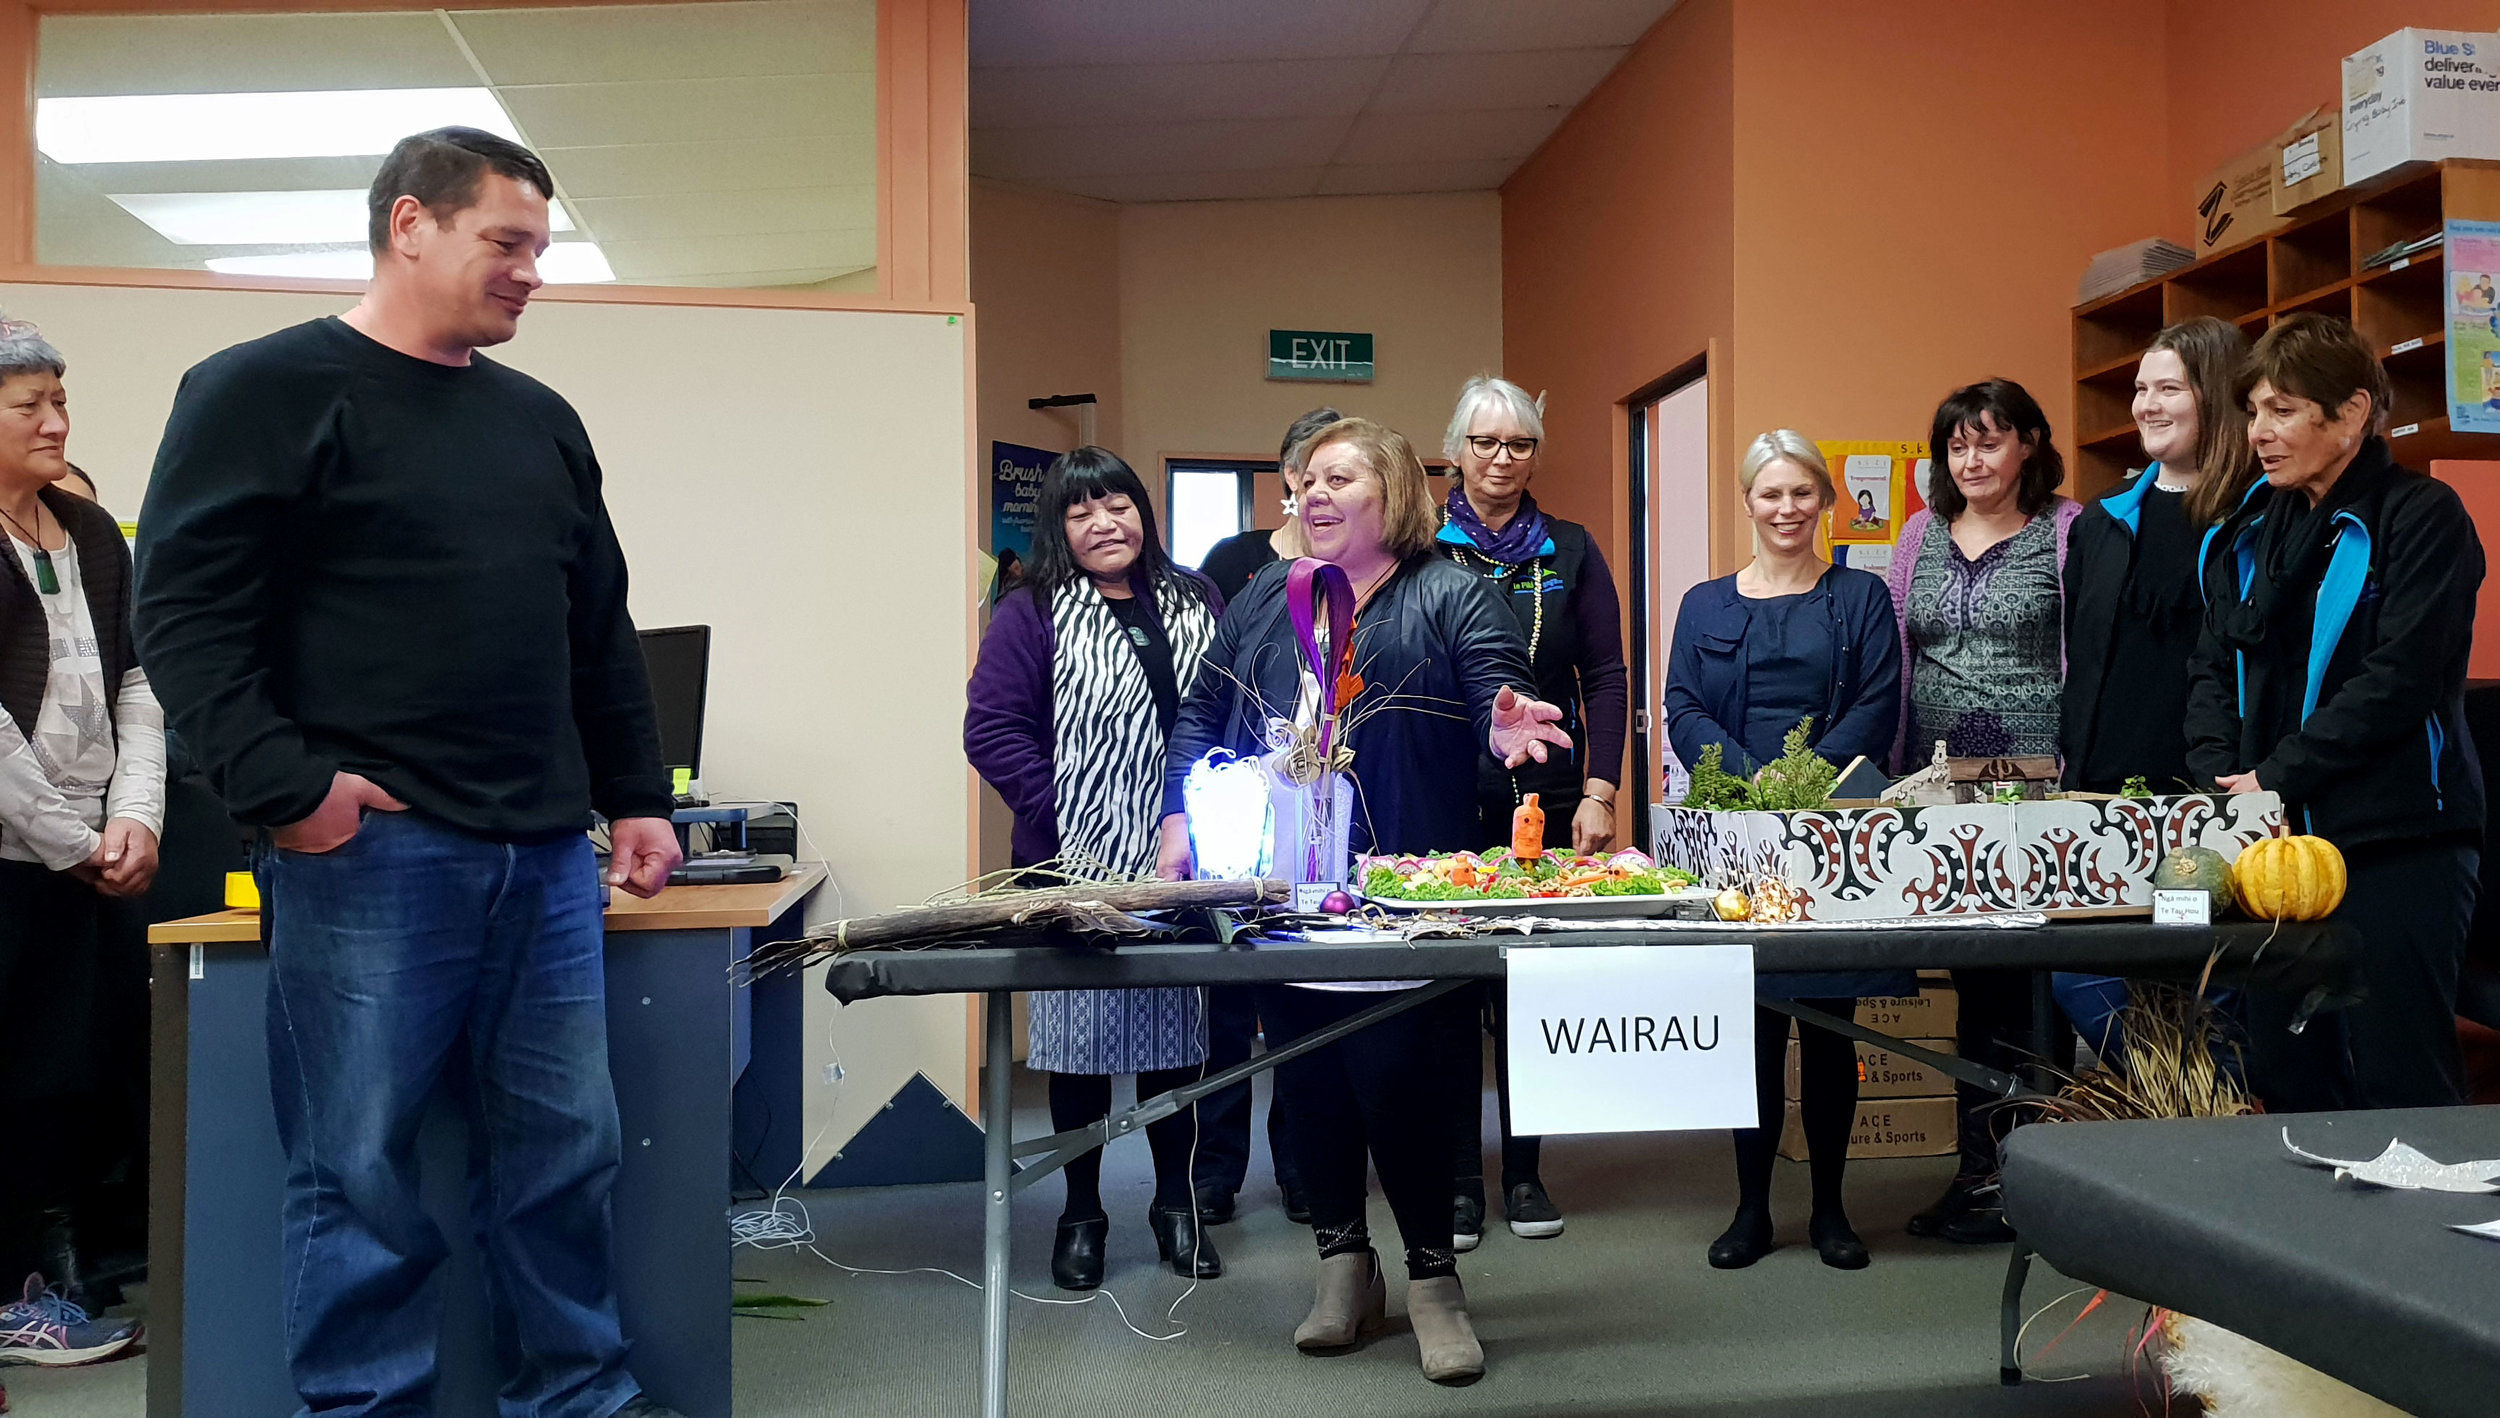 Wairau, third in vegetable/fruit animal